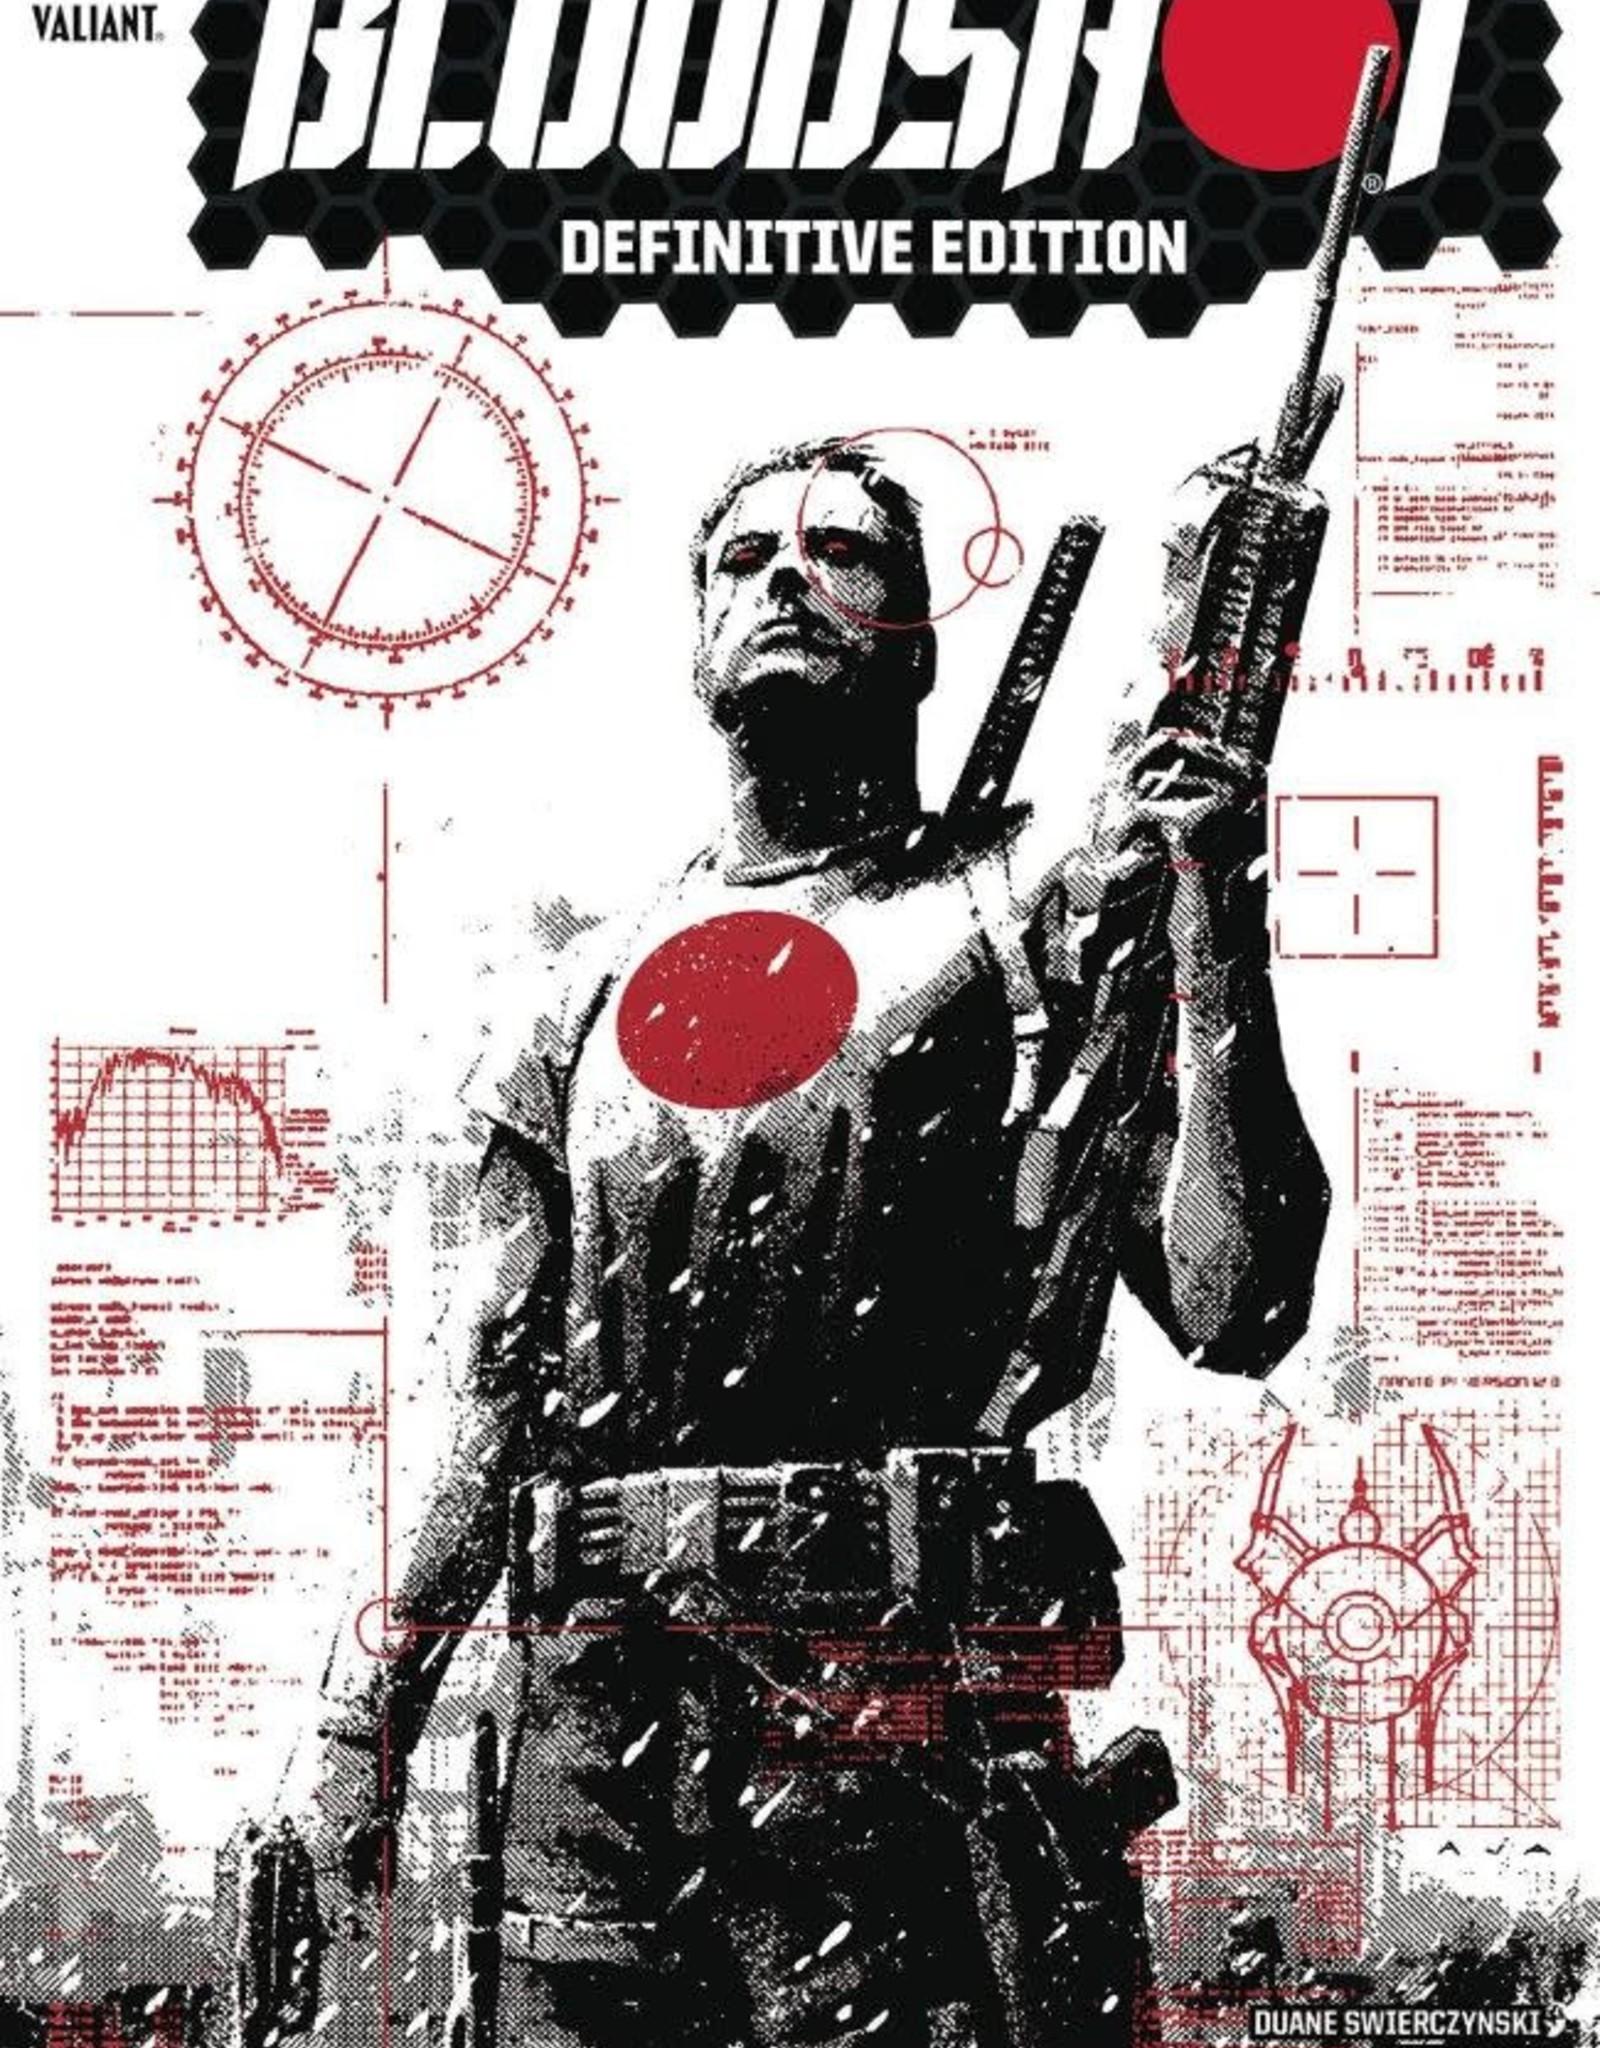 Valiant Entertainment Bloodshot Definitive Edition